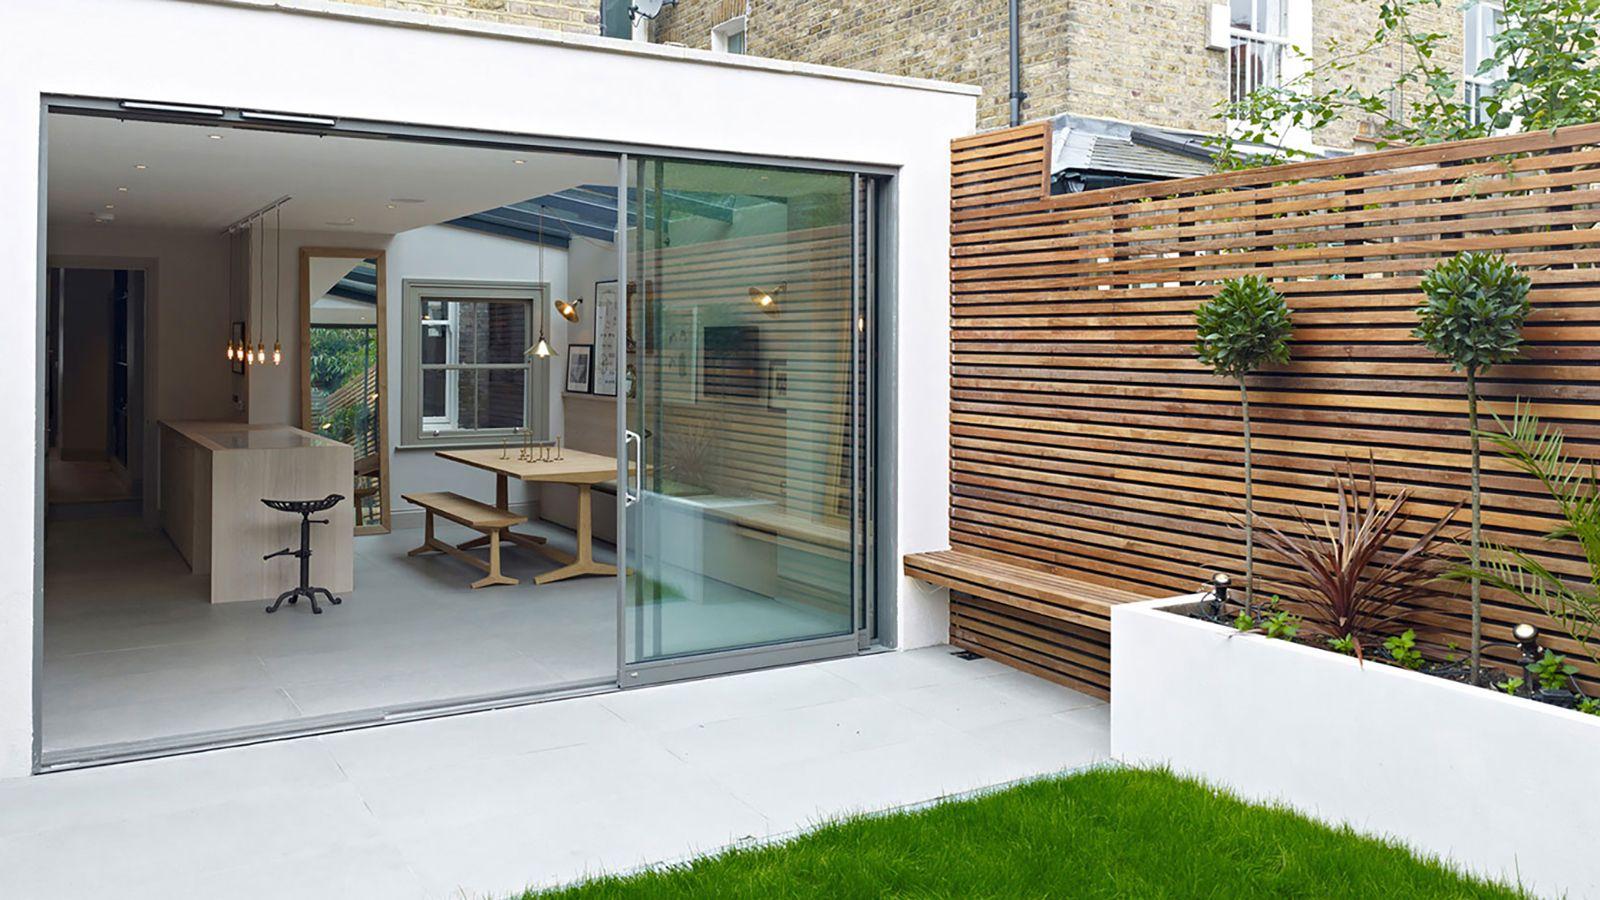 Hillier ~ Modern Tiles Patio - Outside Space ~ Garden  Design ~ Royal Mosa Floor Tiles  @ Material Plans